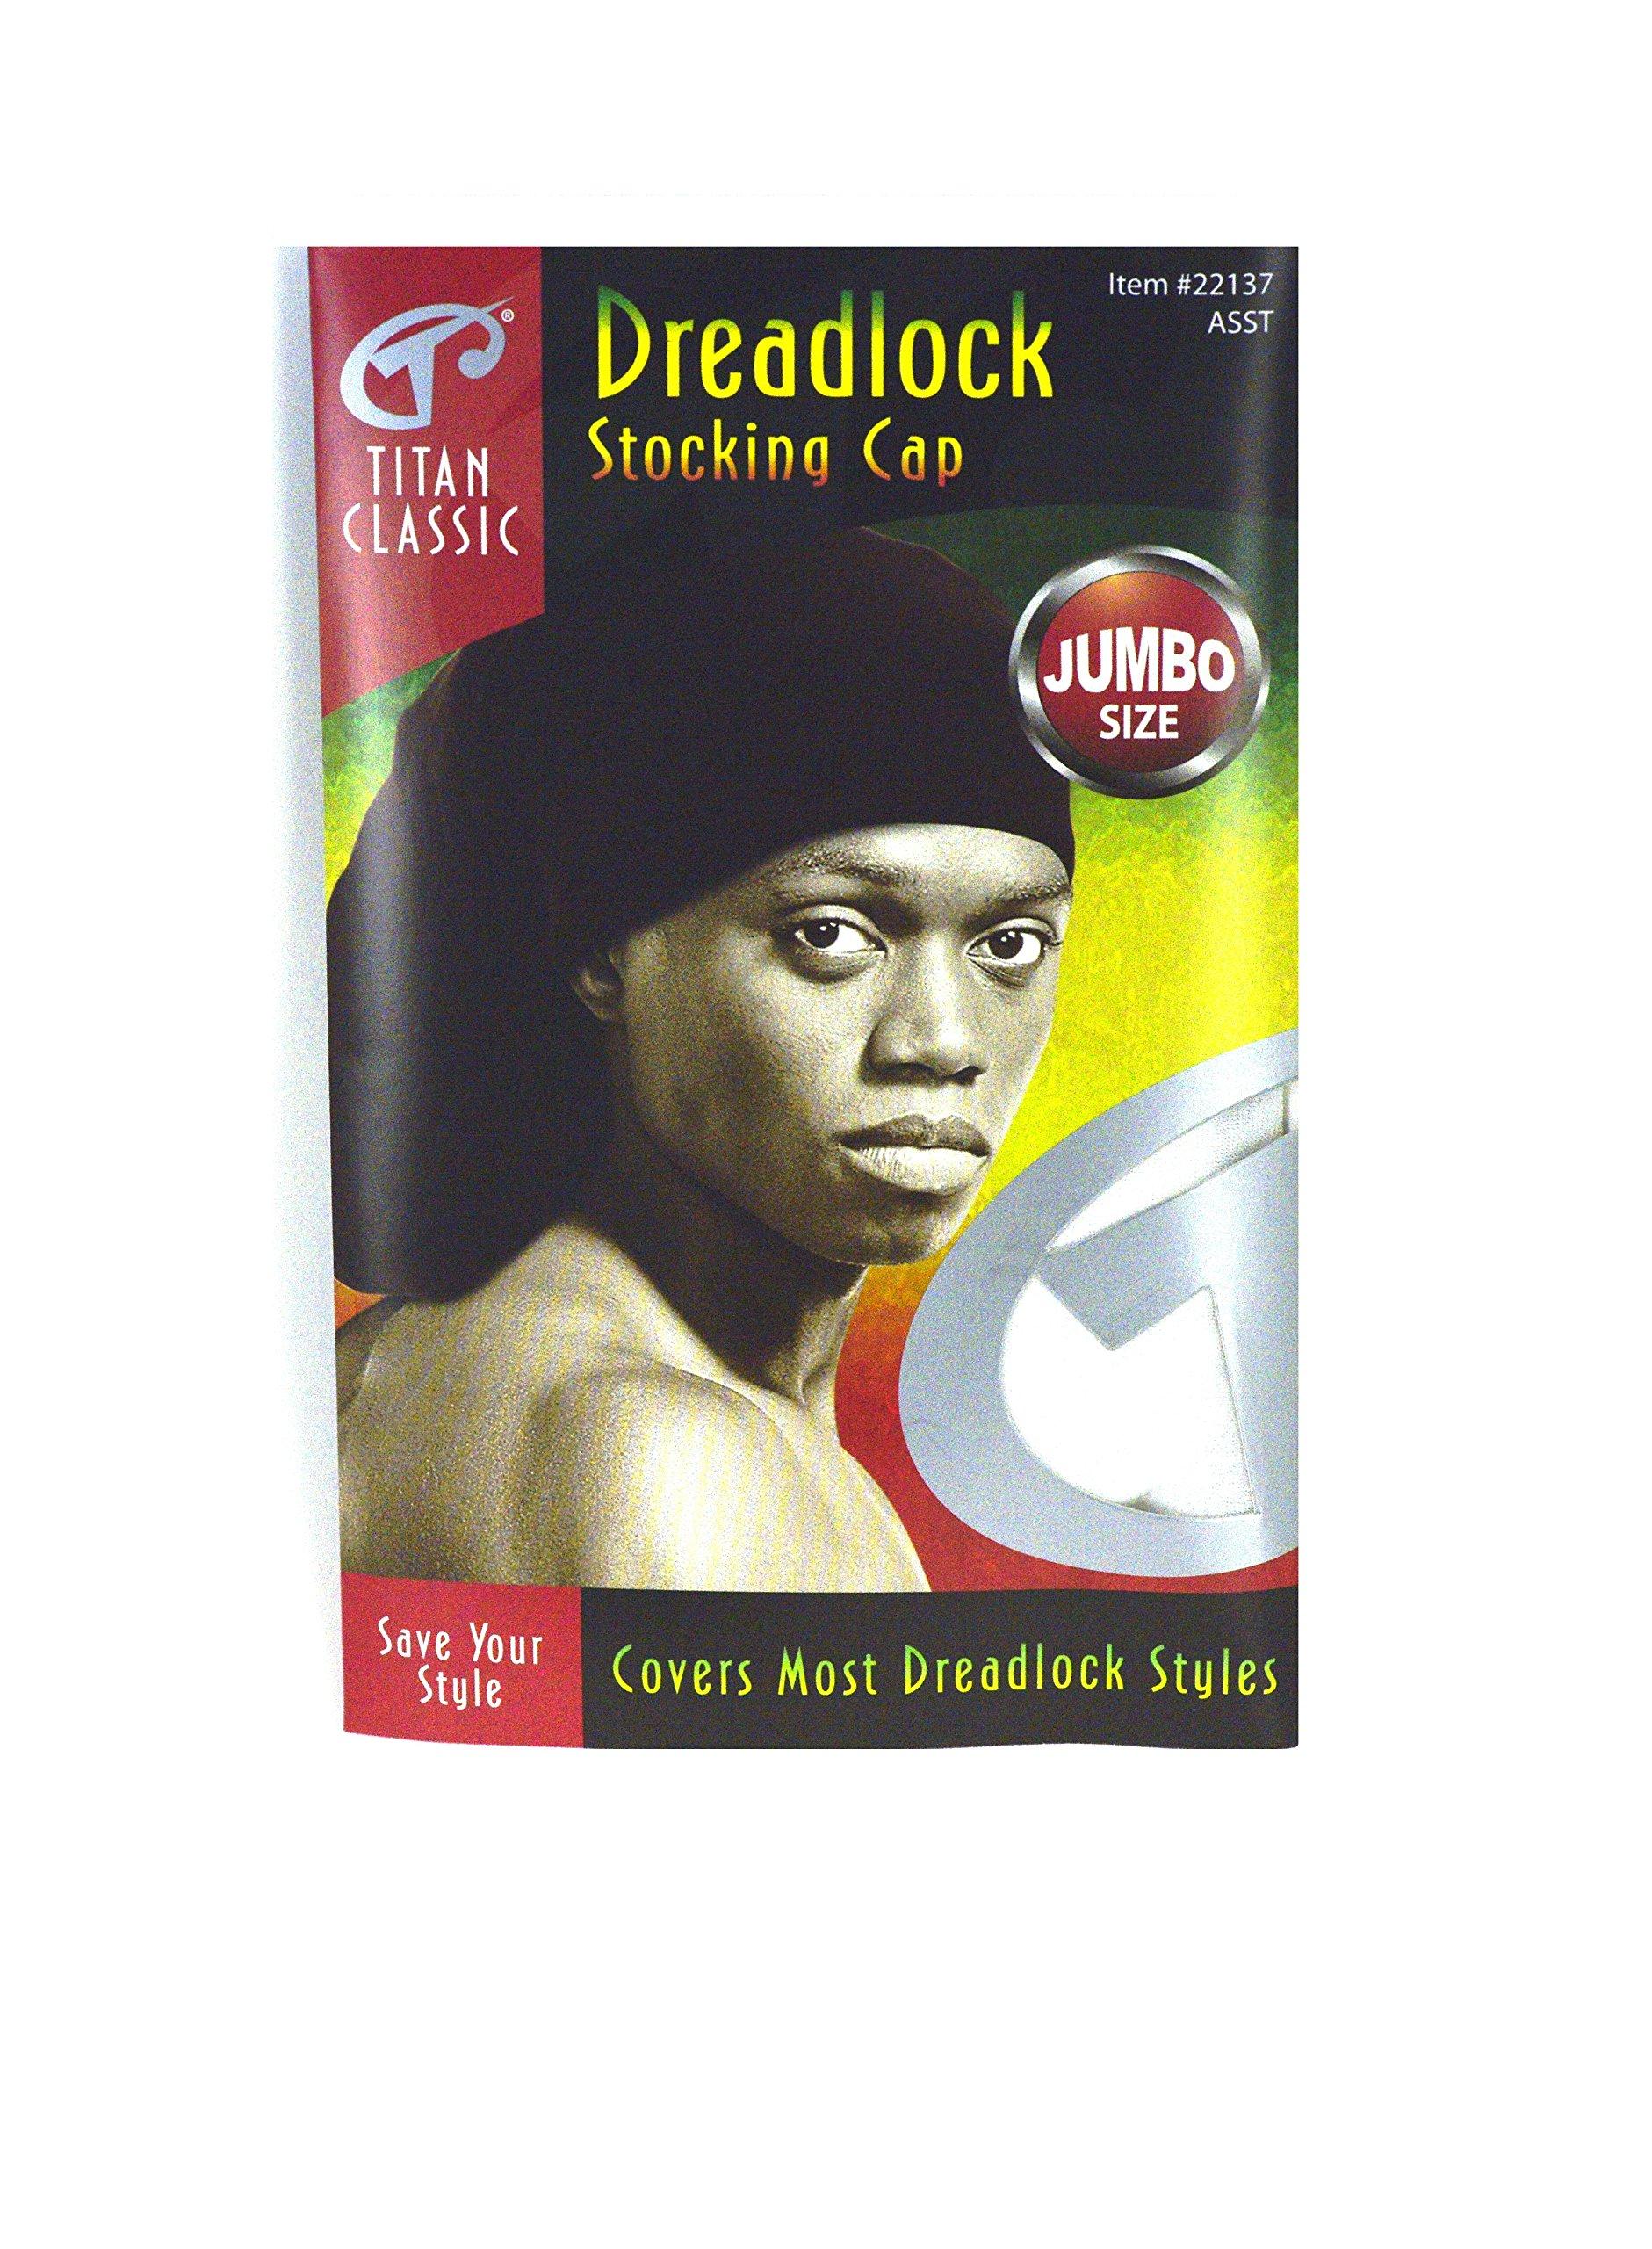 ab7c5dfc766 Amazon.com   Titan Classic Dreadlock Stocking Cap Jumbo Size Kufi ...